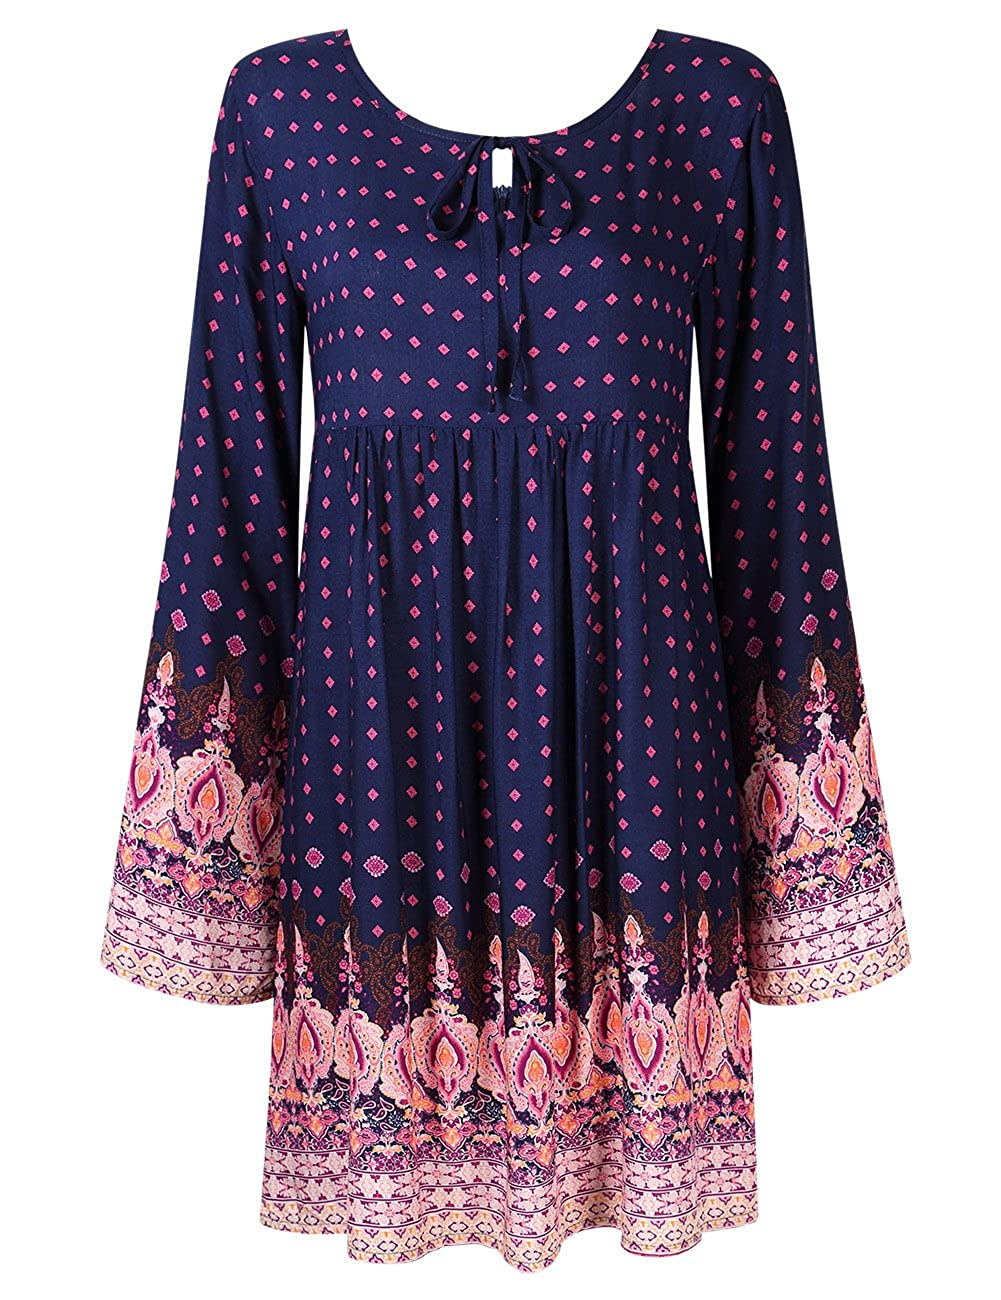 YesFashion Women Bohemian Vintage Floral Printed Ethnic Loose Casual Dress Y6-K1E5-9EMW